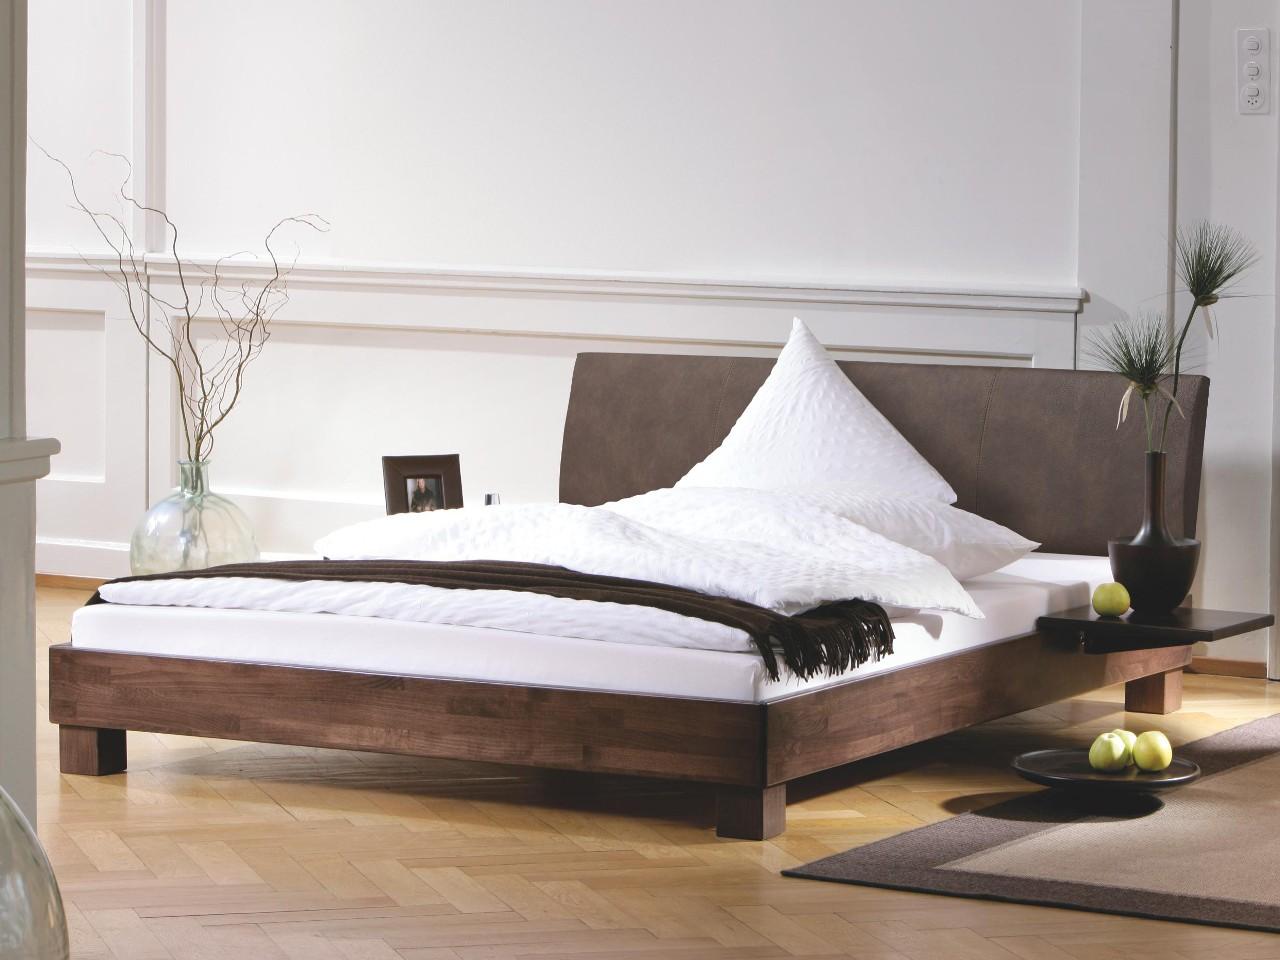 Wood-Line Bett Ivio Lecco 120x200 Casual carbon 334 Buche weiss